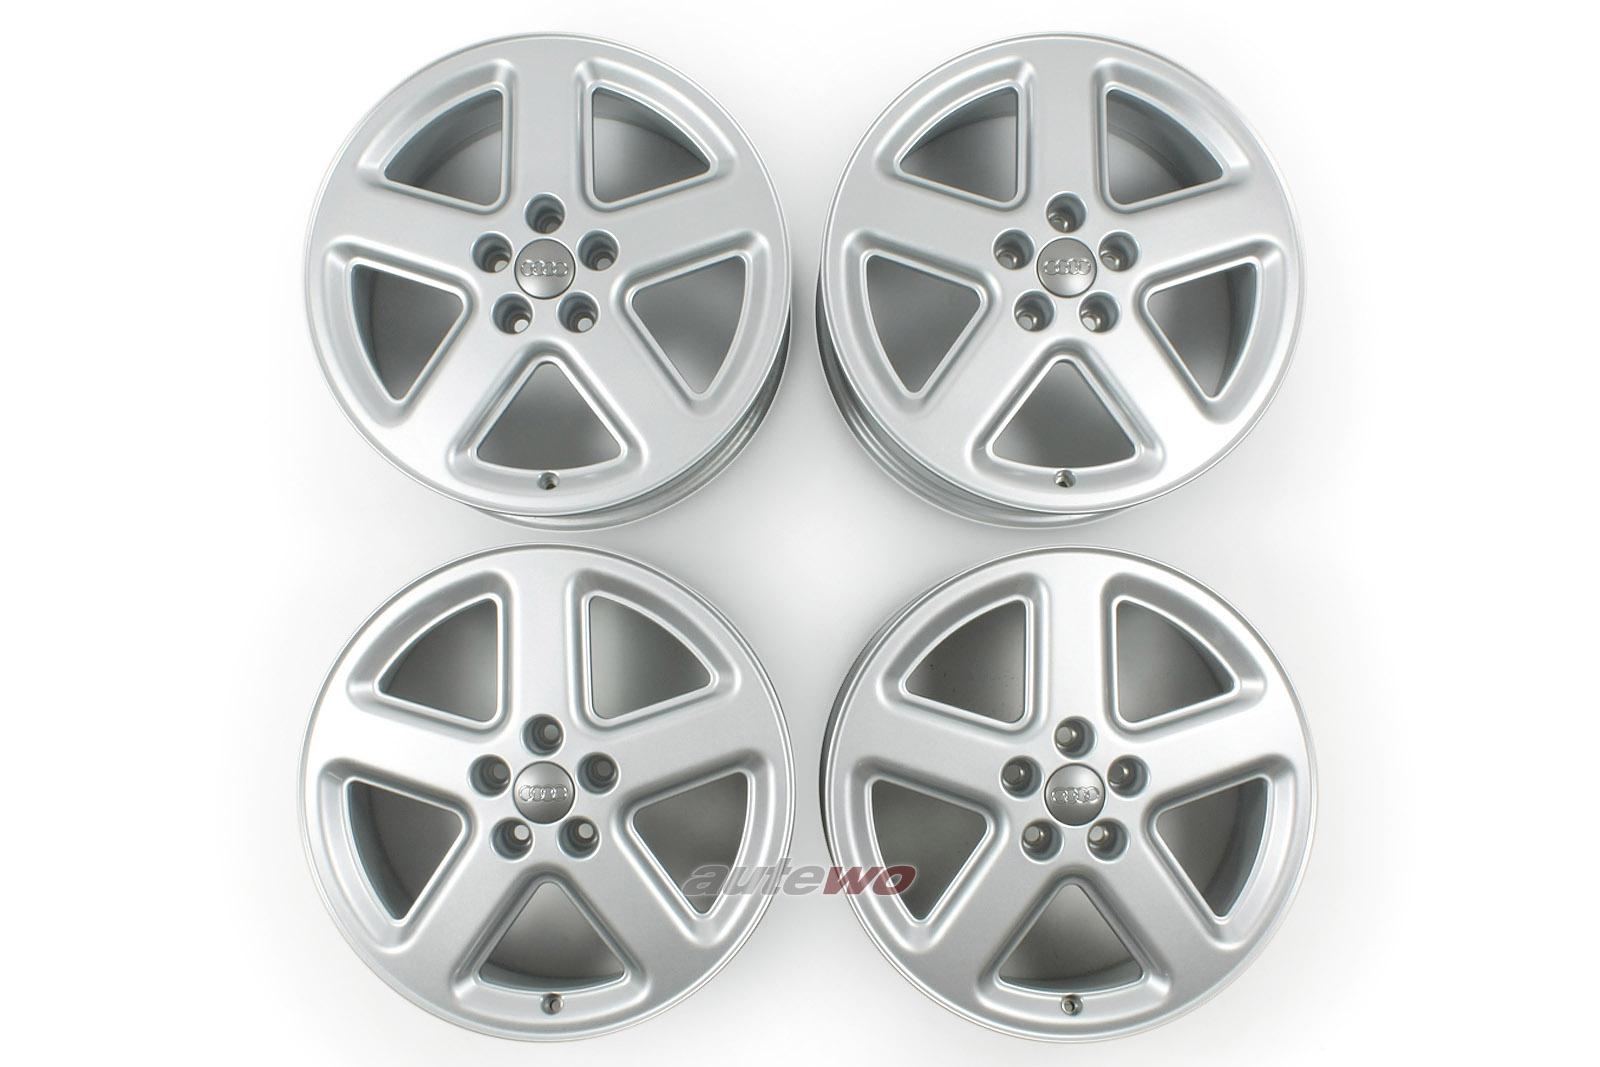 4D0601025AD NEU Audi A8/S8 D2 Satz 5-Speichen-S-Line-Felgen 8x18 ET48 5x112